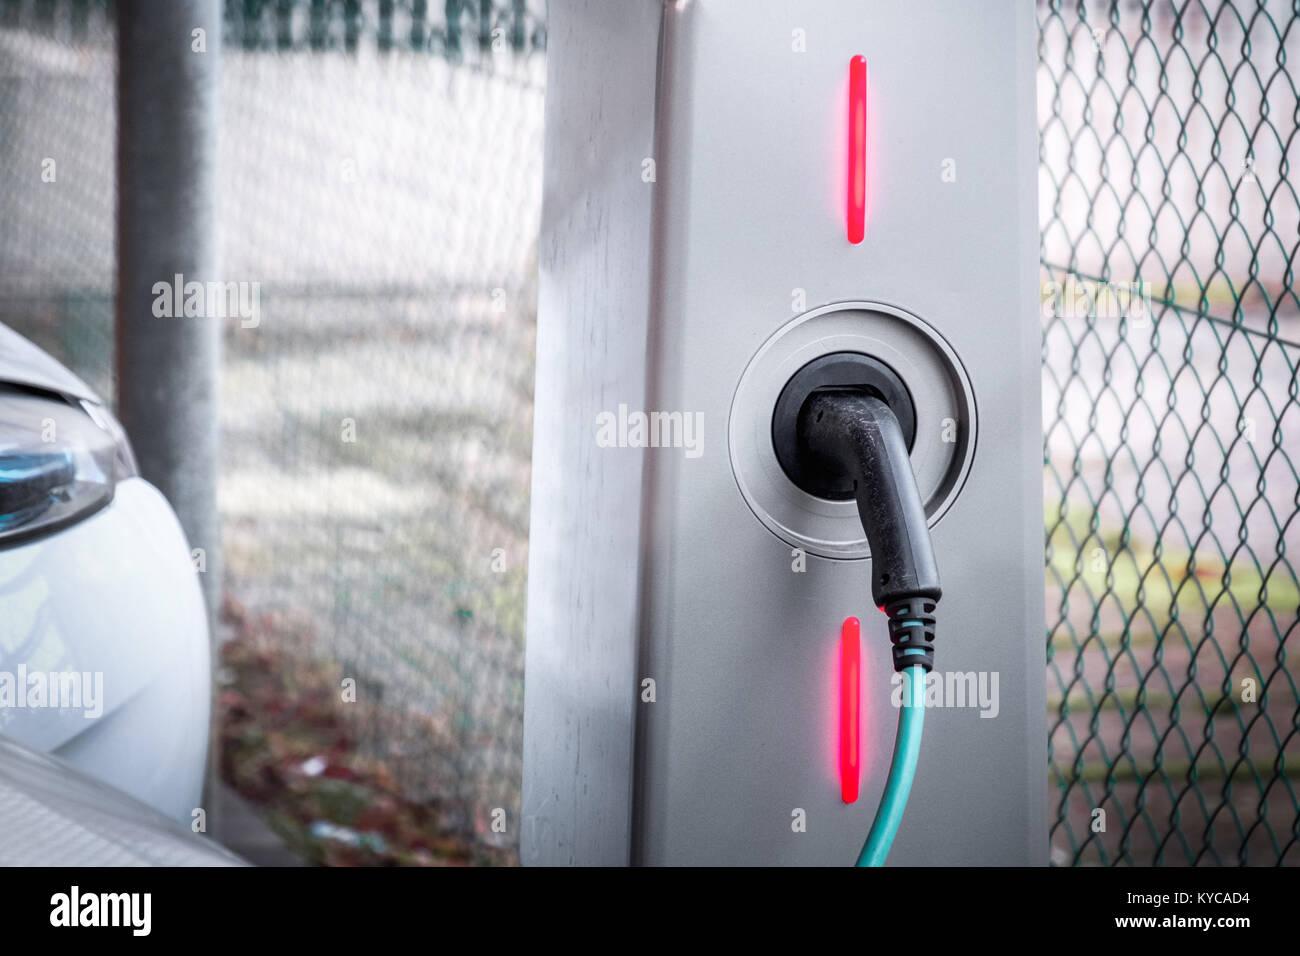 charging station electric car motor ecologically sustainable transportation - Stock Image